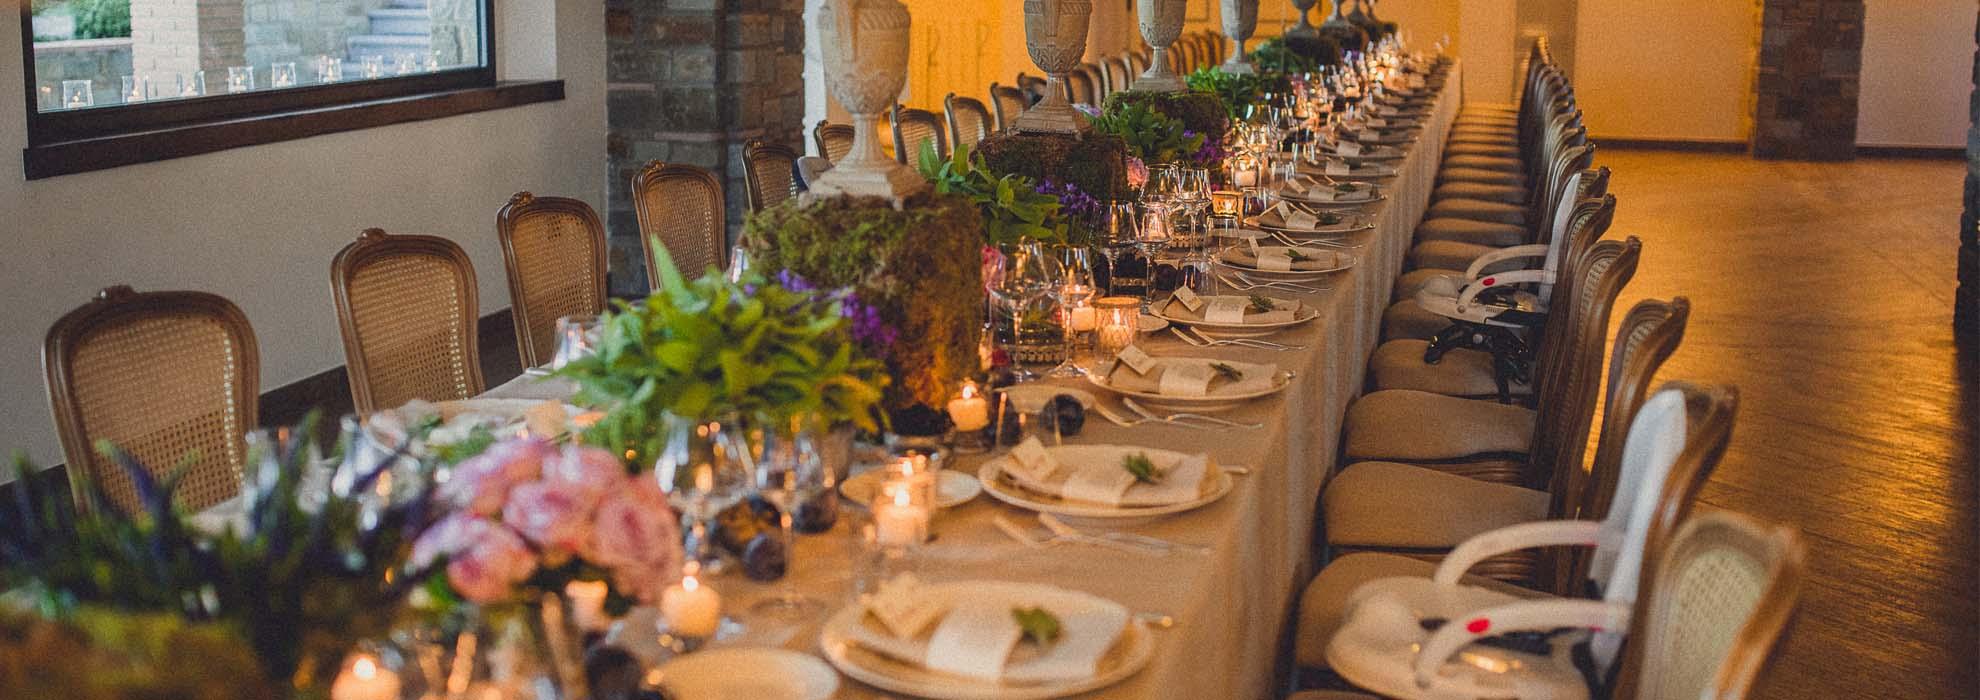 Location Matrimonio Toscana : Location matrimoni toscana antico fio simona celani